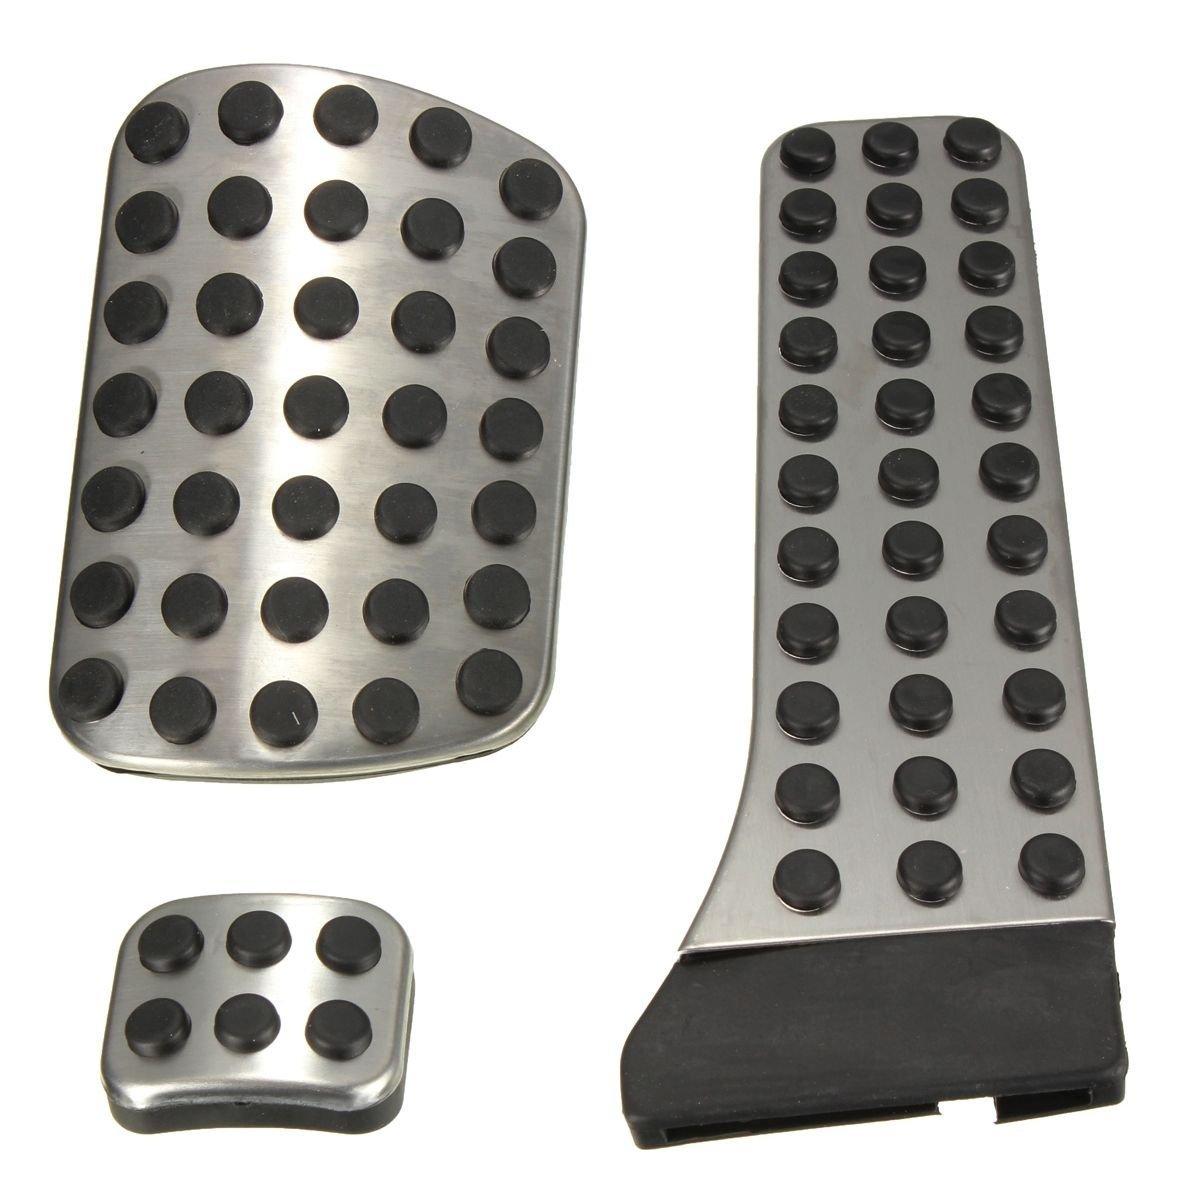 Clutch Pad Material : Car accelerator brake rest set at clutch pad pedal